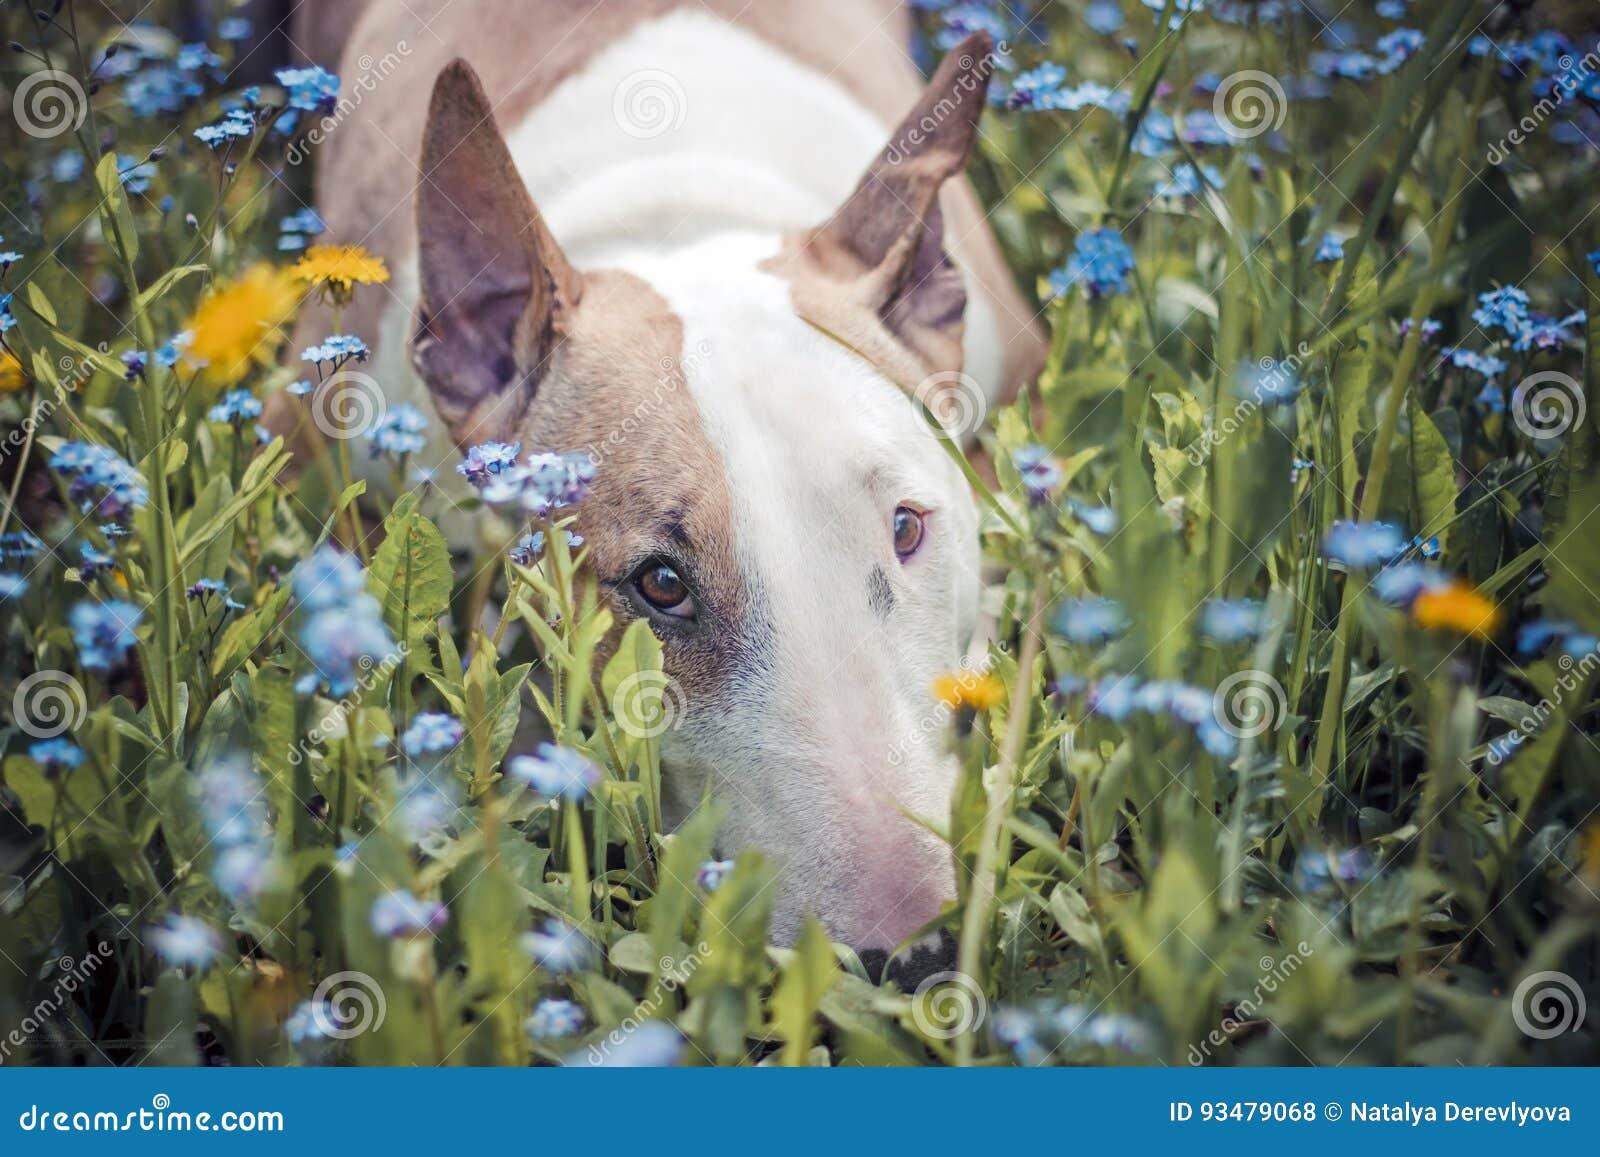 Cane, fiori, tristi